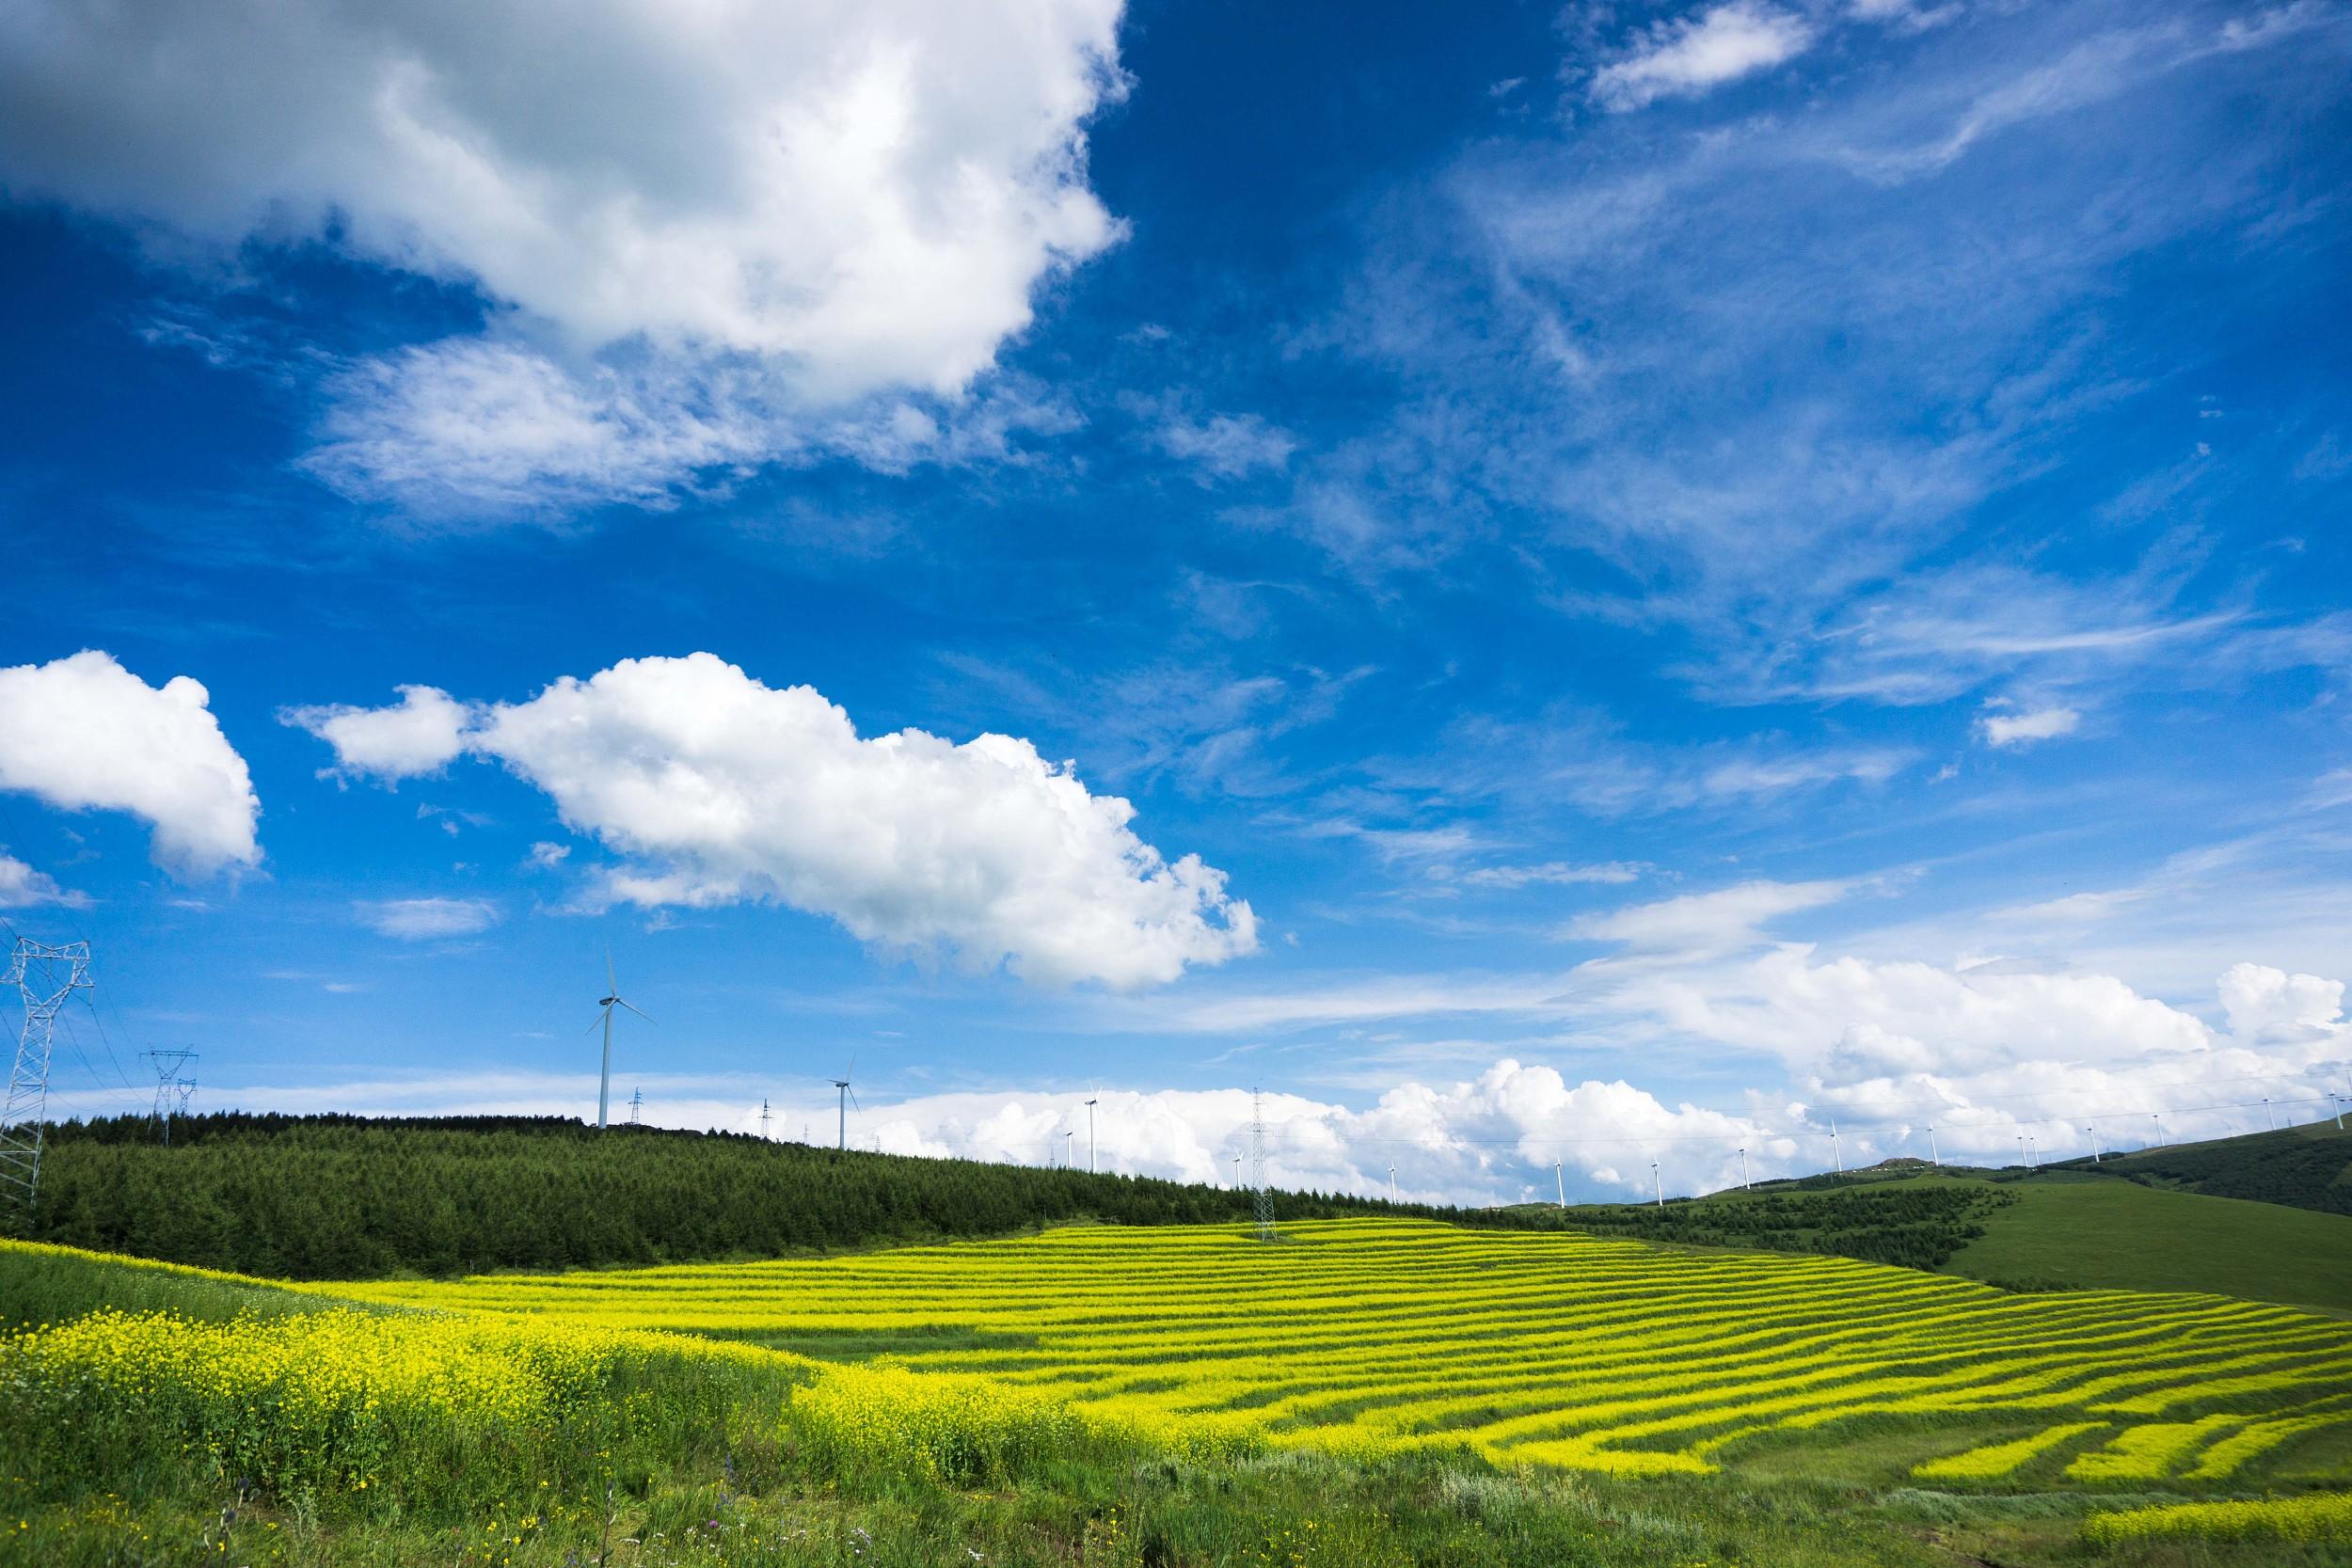 Zhangbei Zhongdu Grasslands